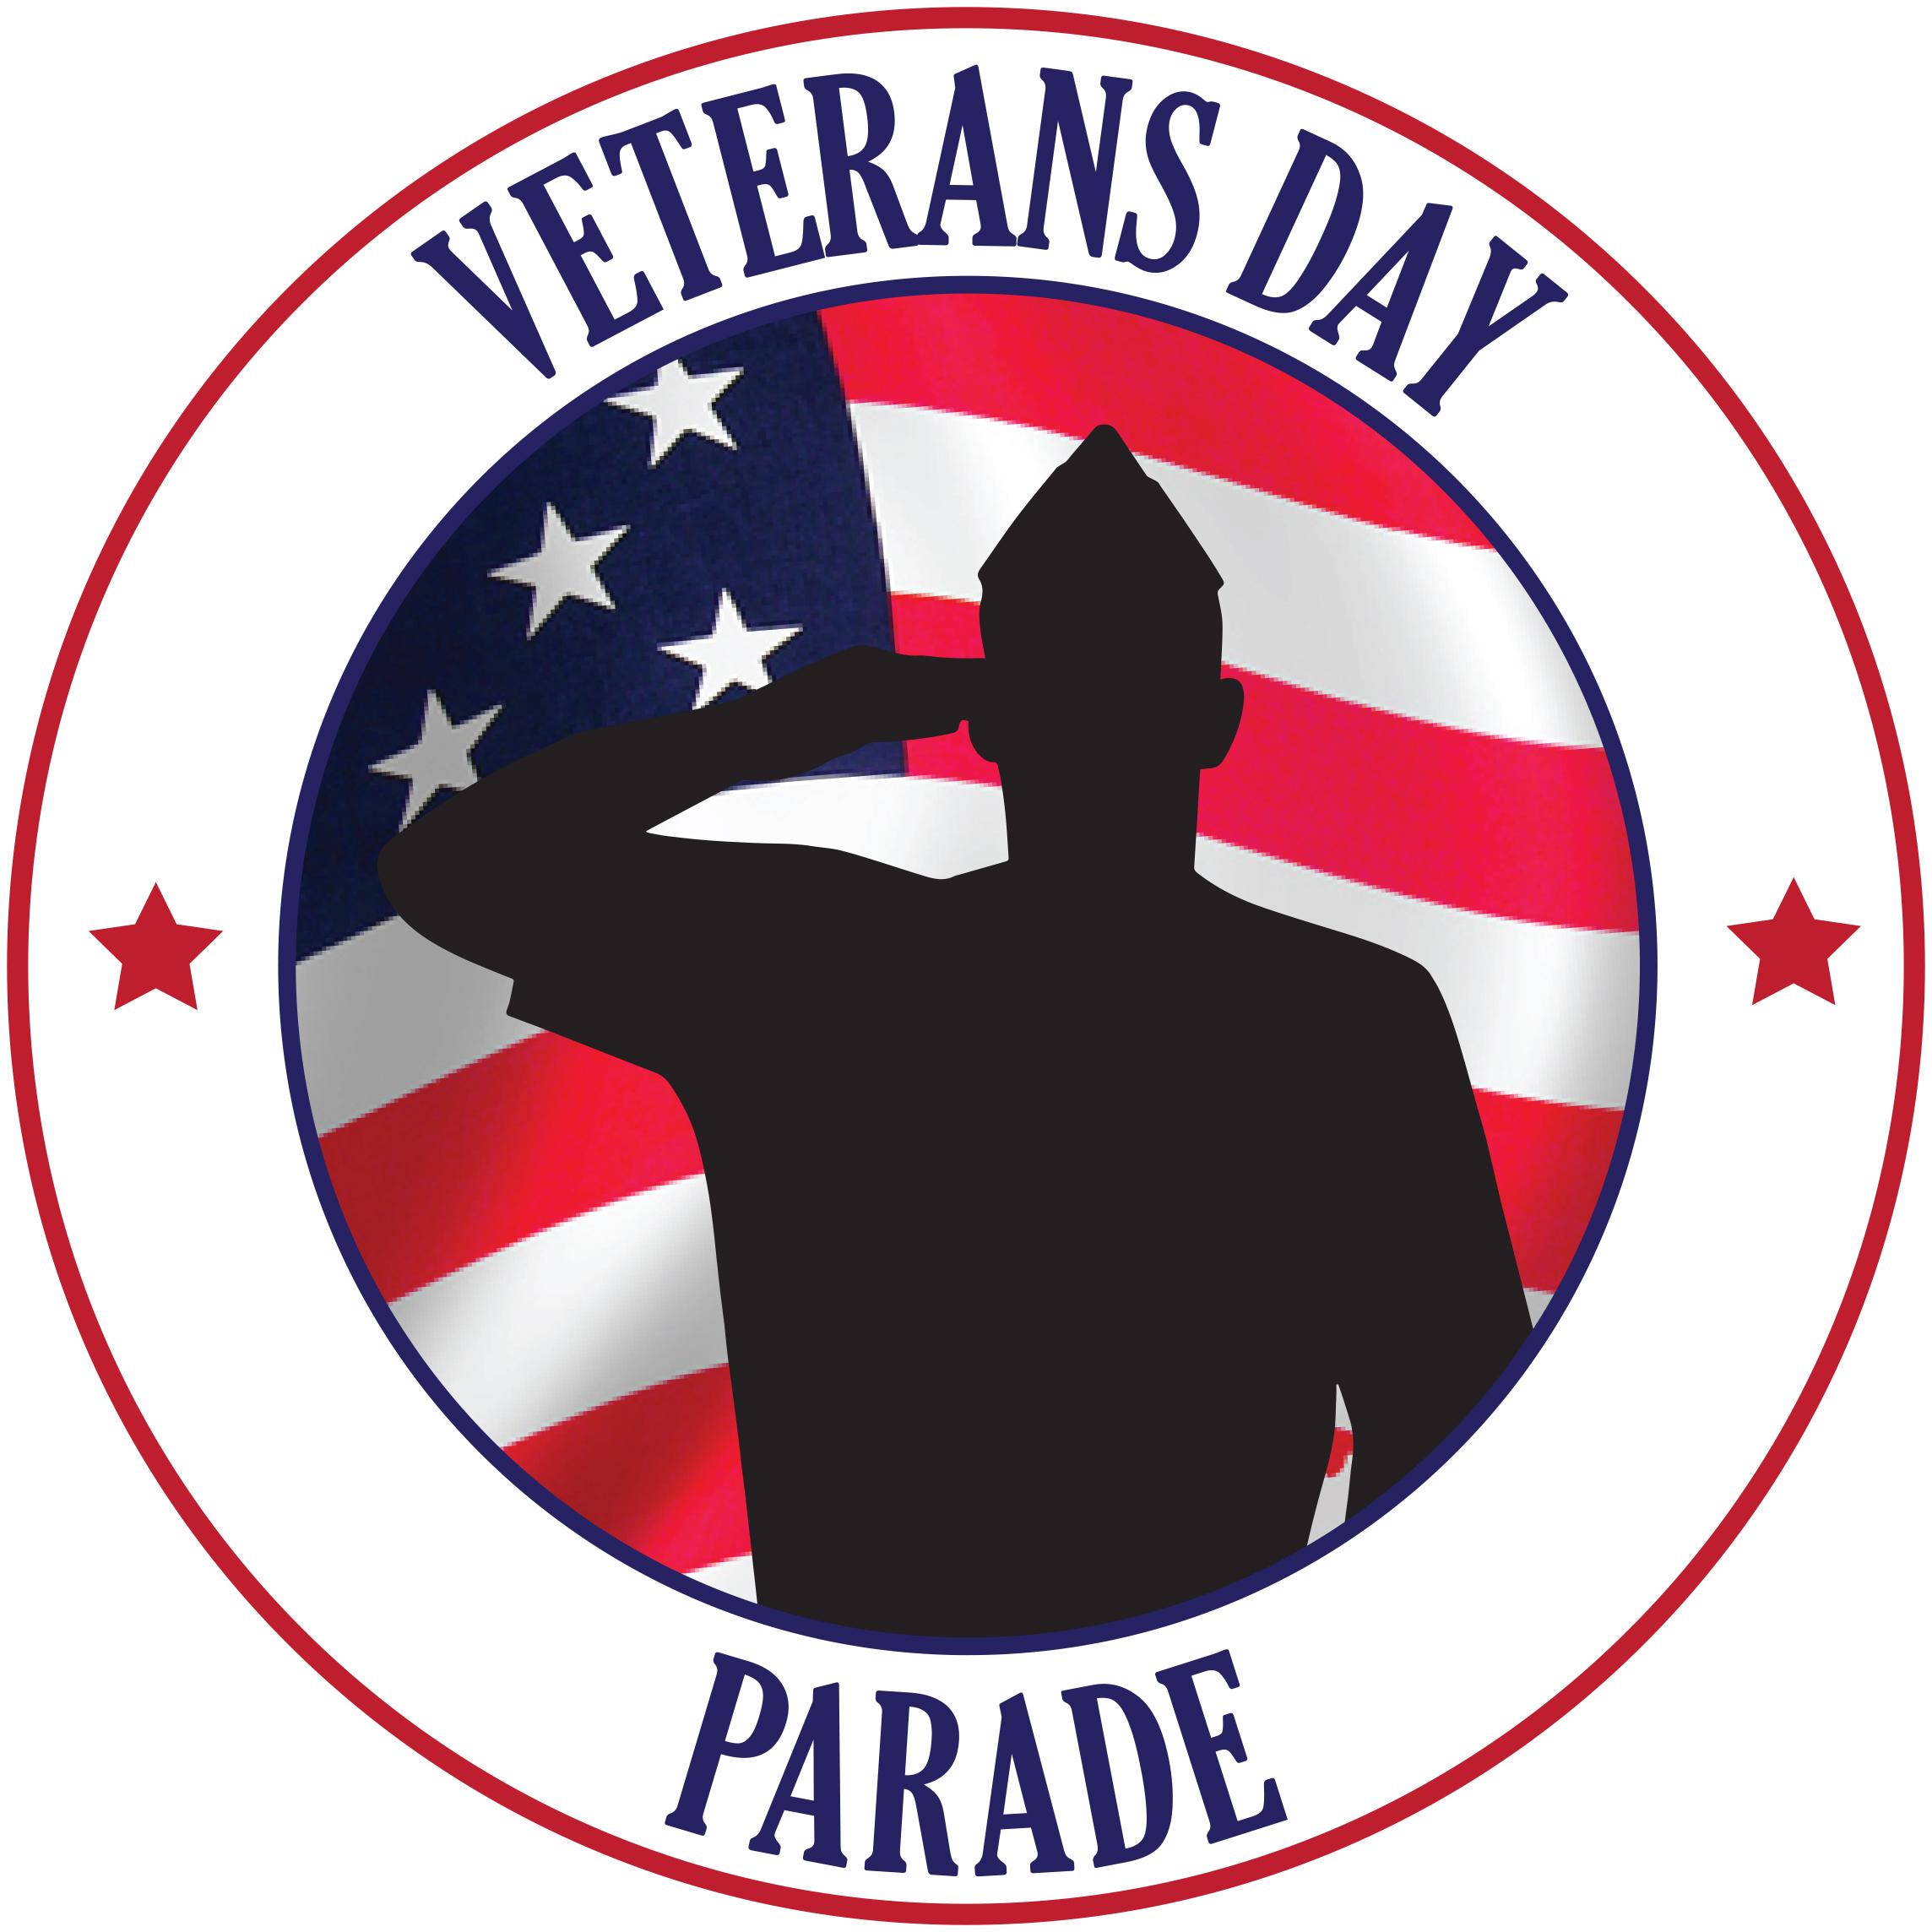 VeteransDaySeal_2013-3.jpg